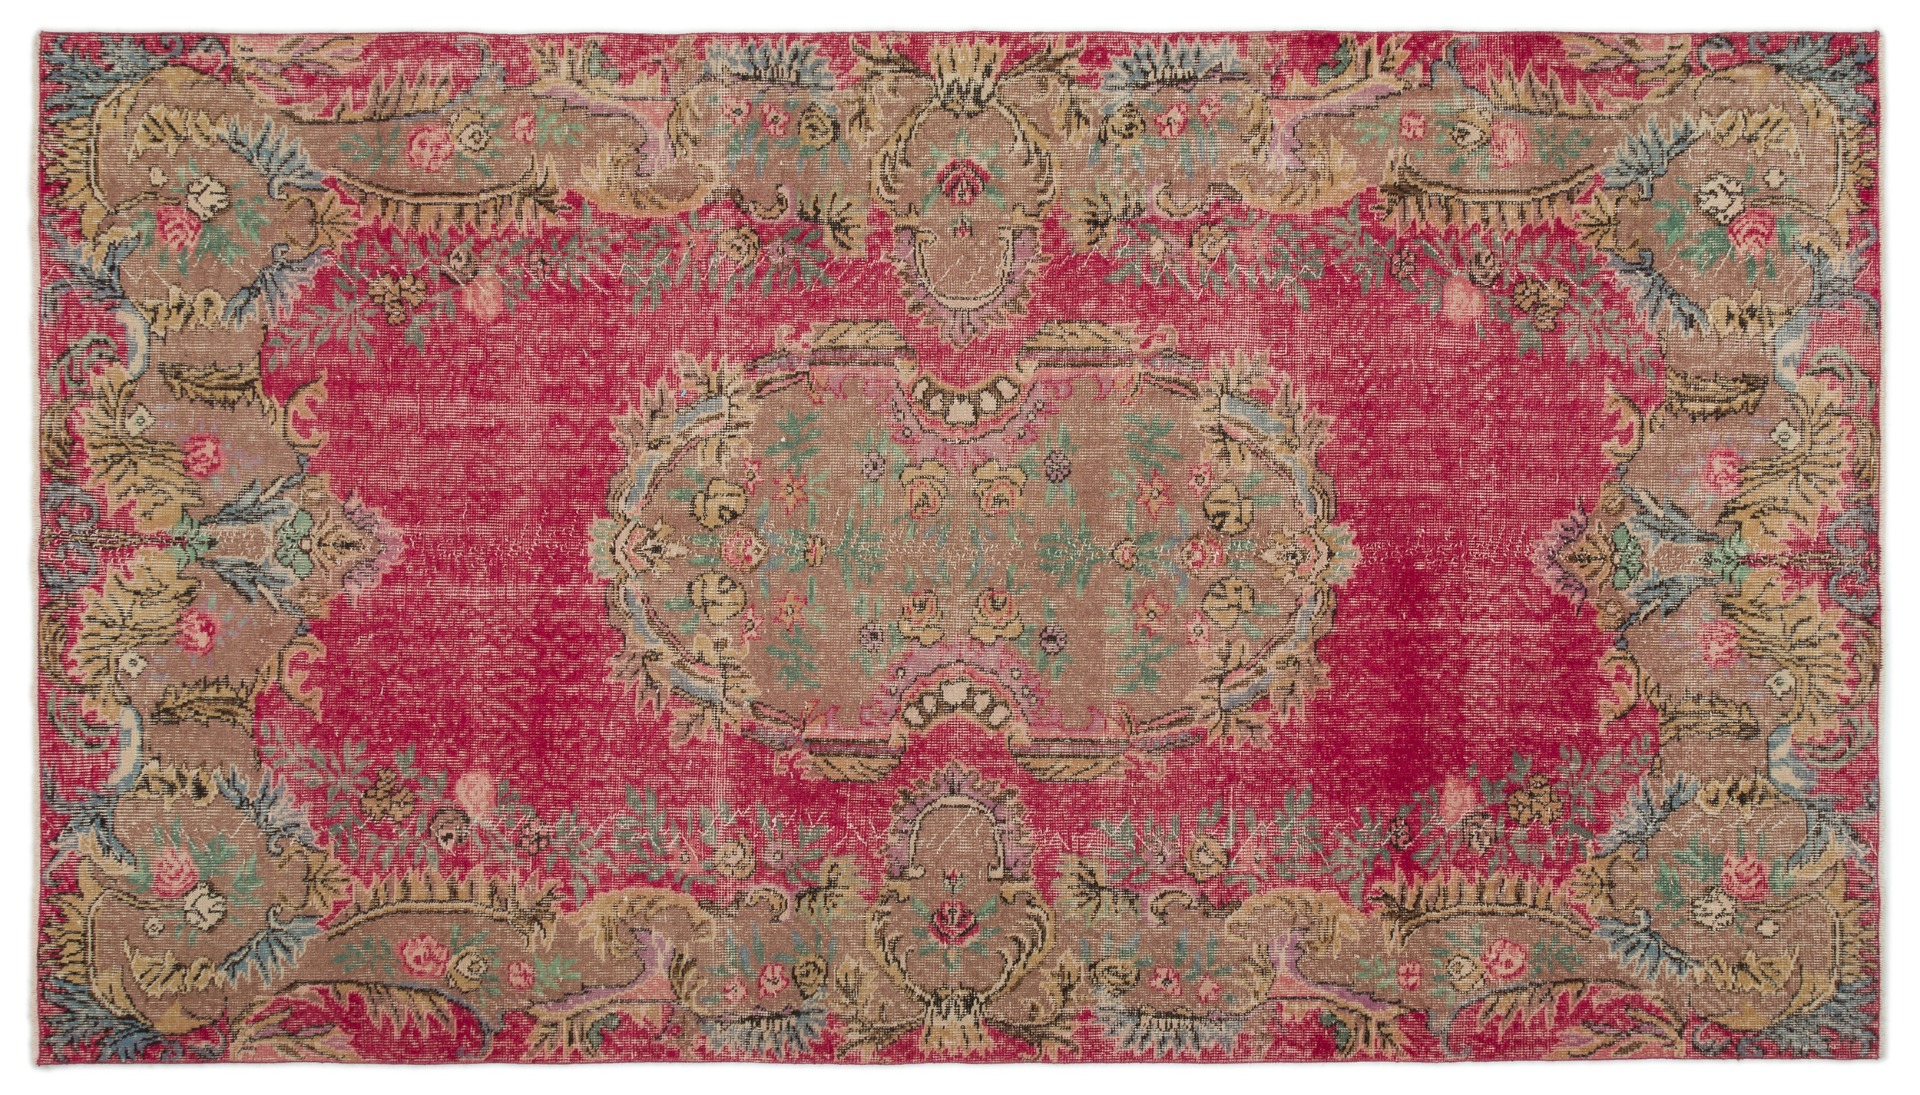 Vintage vloerkleed rood nr:20081 291cm x 166cm